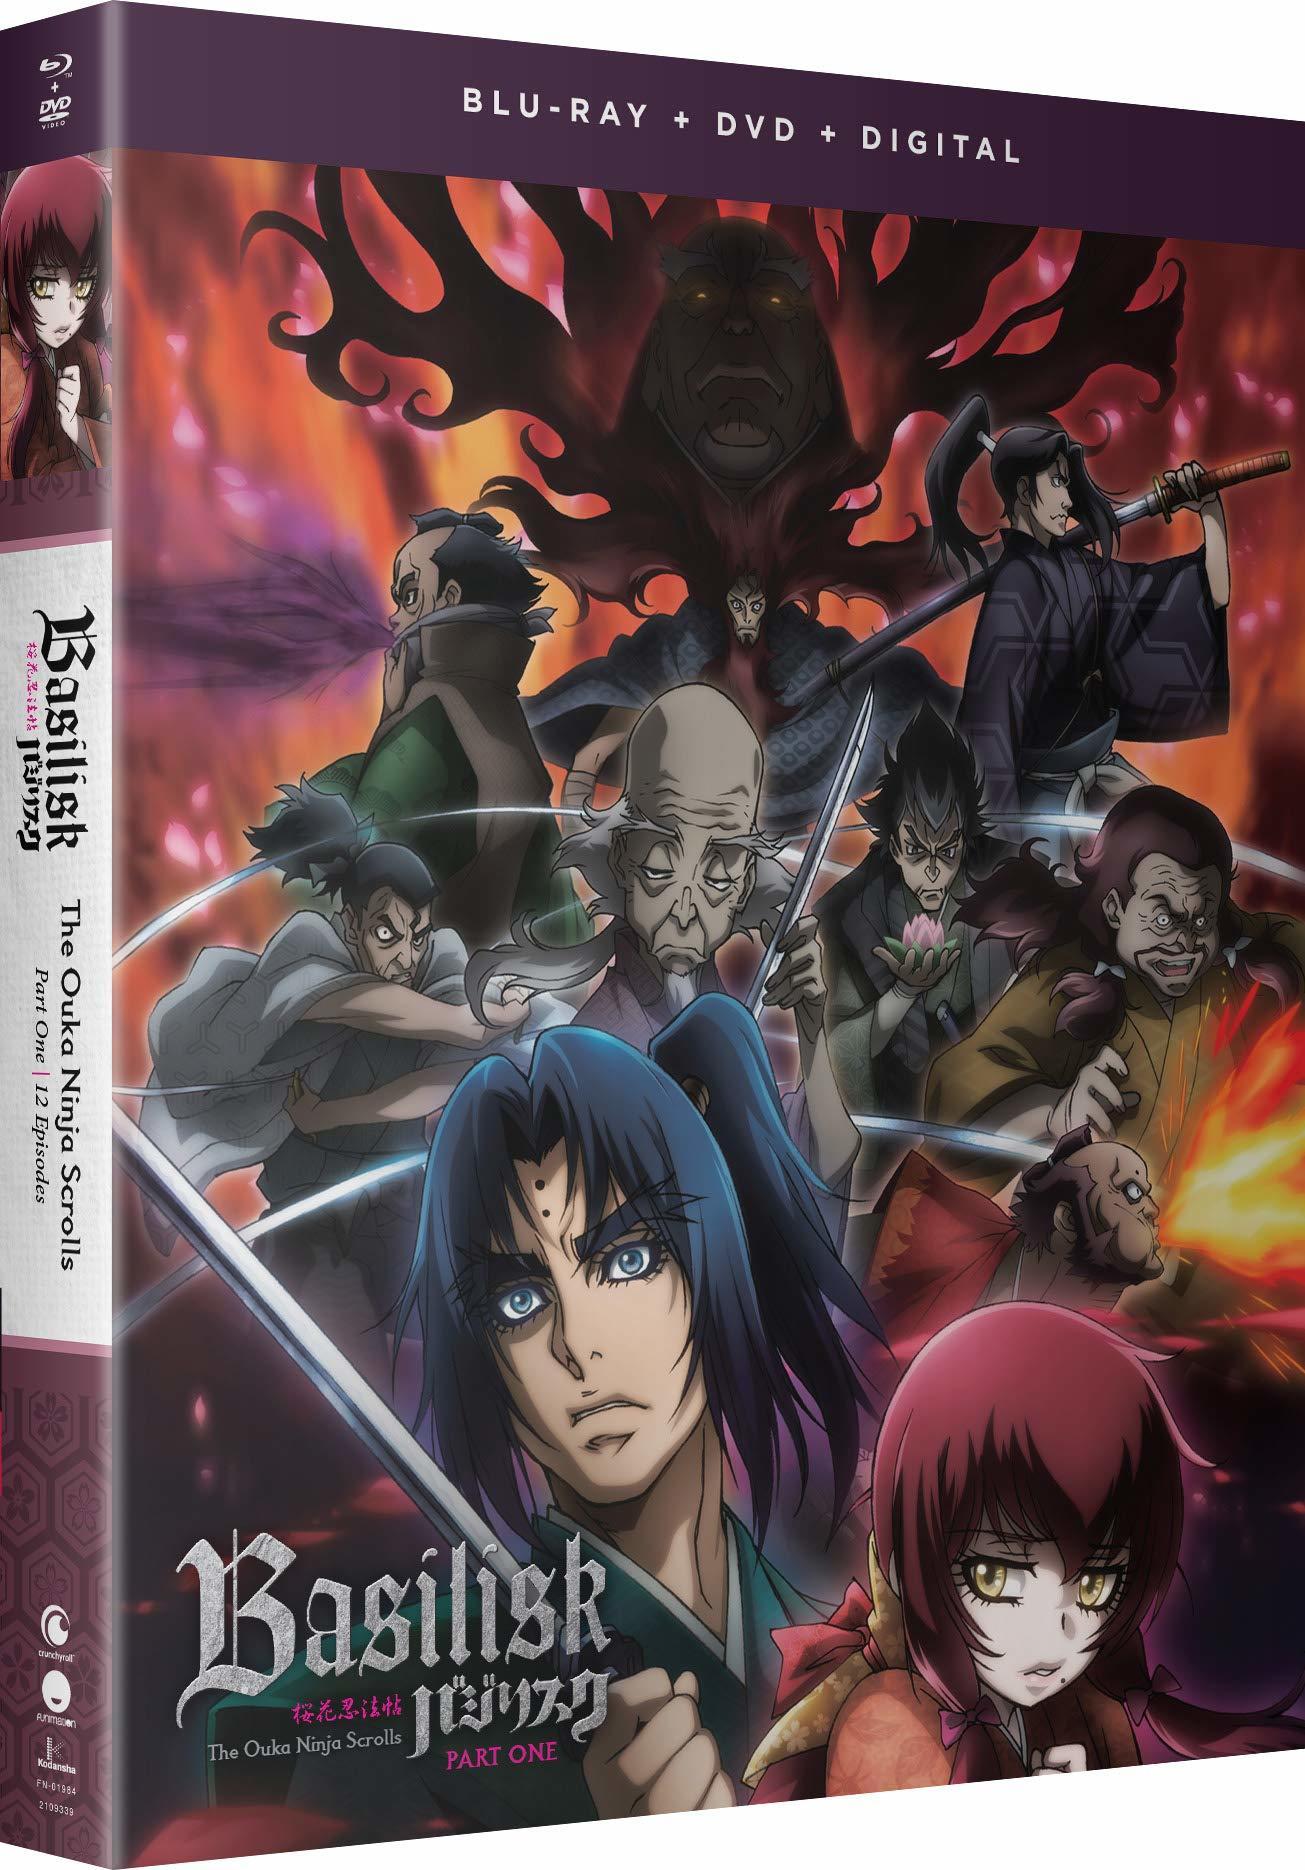 Basilisk The Ouka Ninja Scrolls Part One Blu Ray Release Date April 2 2019 Blu Ray Dvd Digital